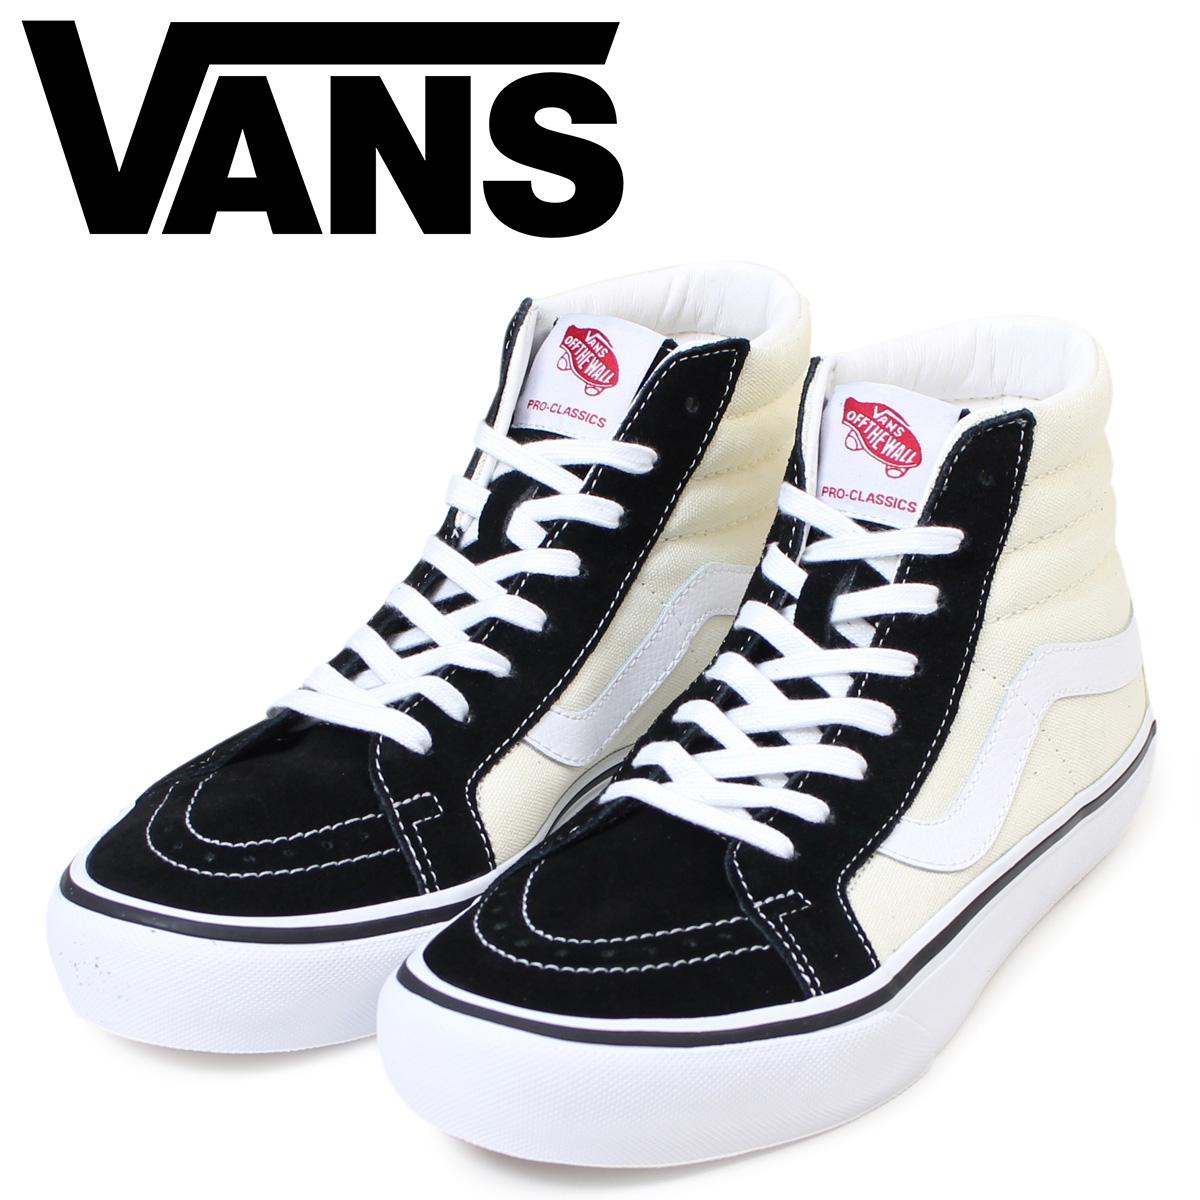 VANS SK8 HI REISSUE PRO sneakers men vans station wagons higher frequency elimination VN000VHGJ6G black white